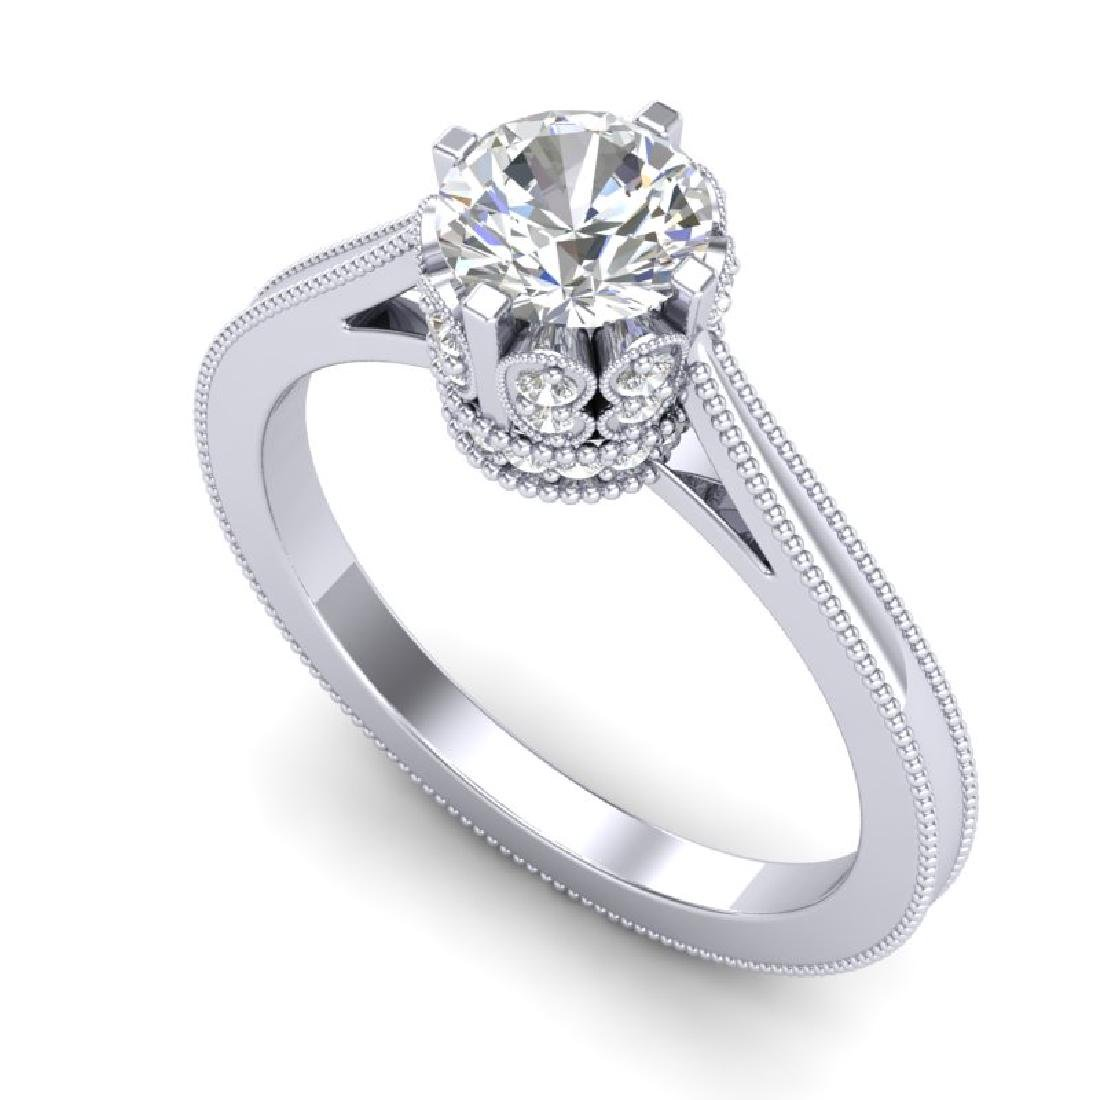 1.14 CTW VS/SI Diamond Art Deco Ring 18K White Gold